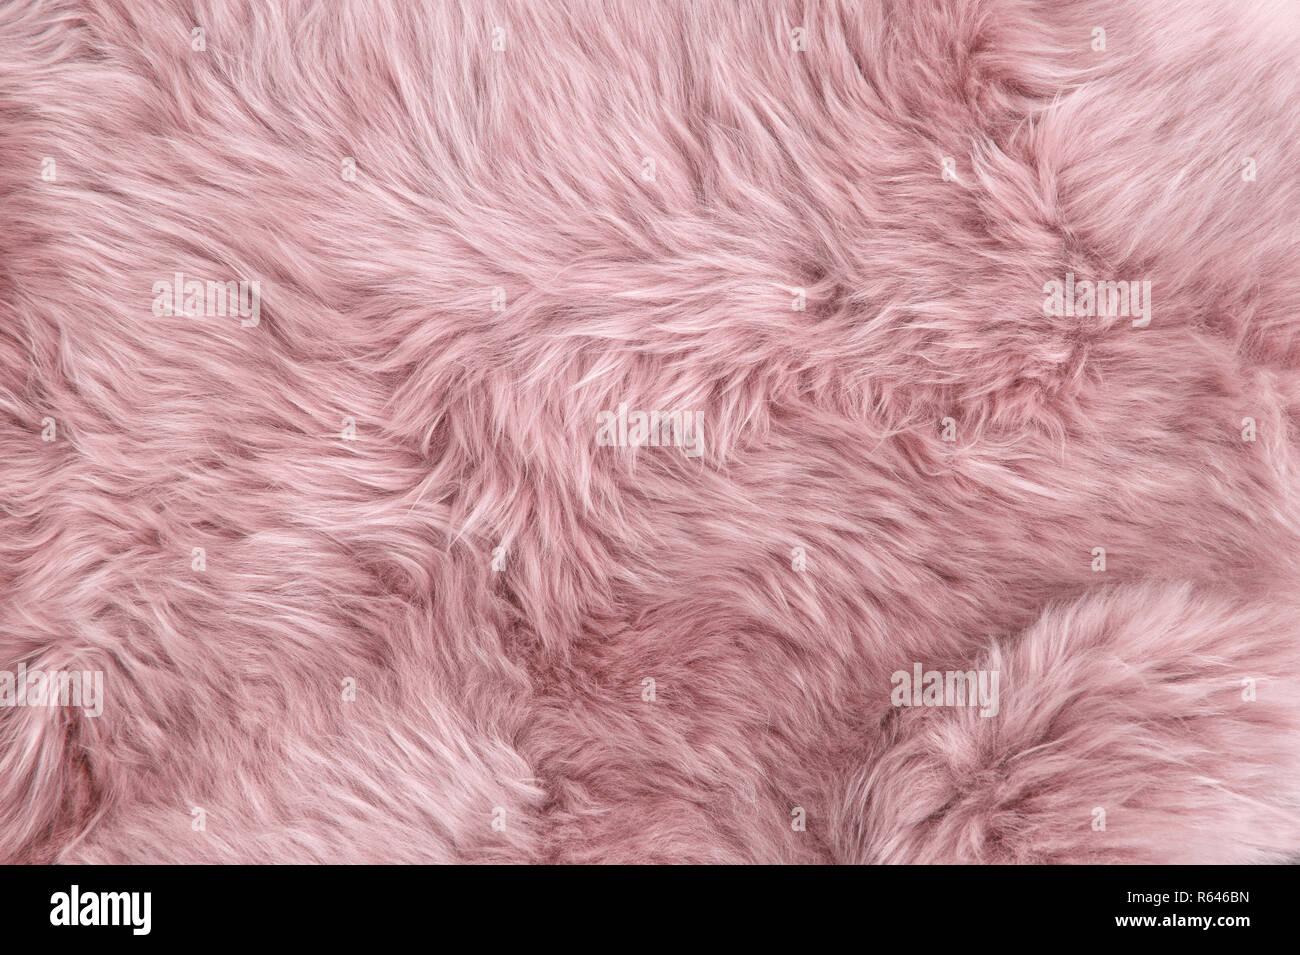 Rosa Pelliccia Di Pecora Pelle Di Pecora Naturale Rug Texture Di